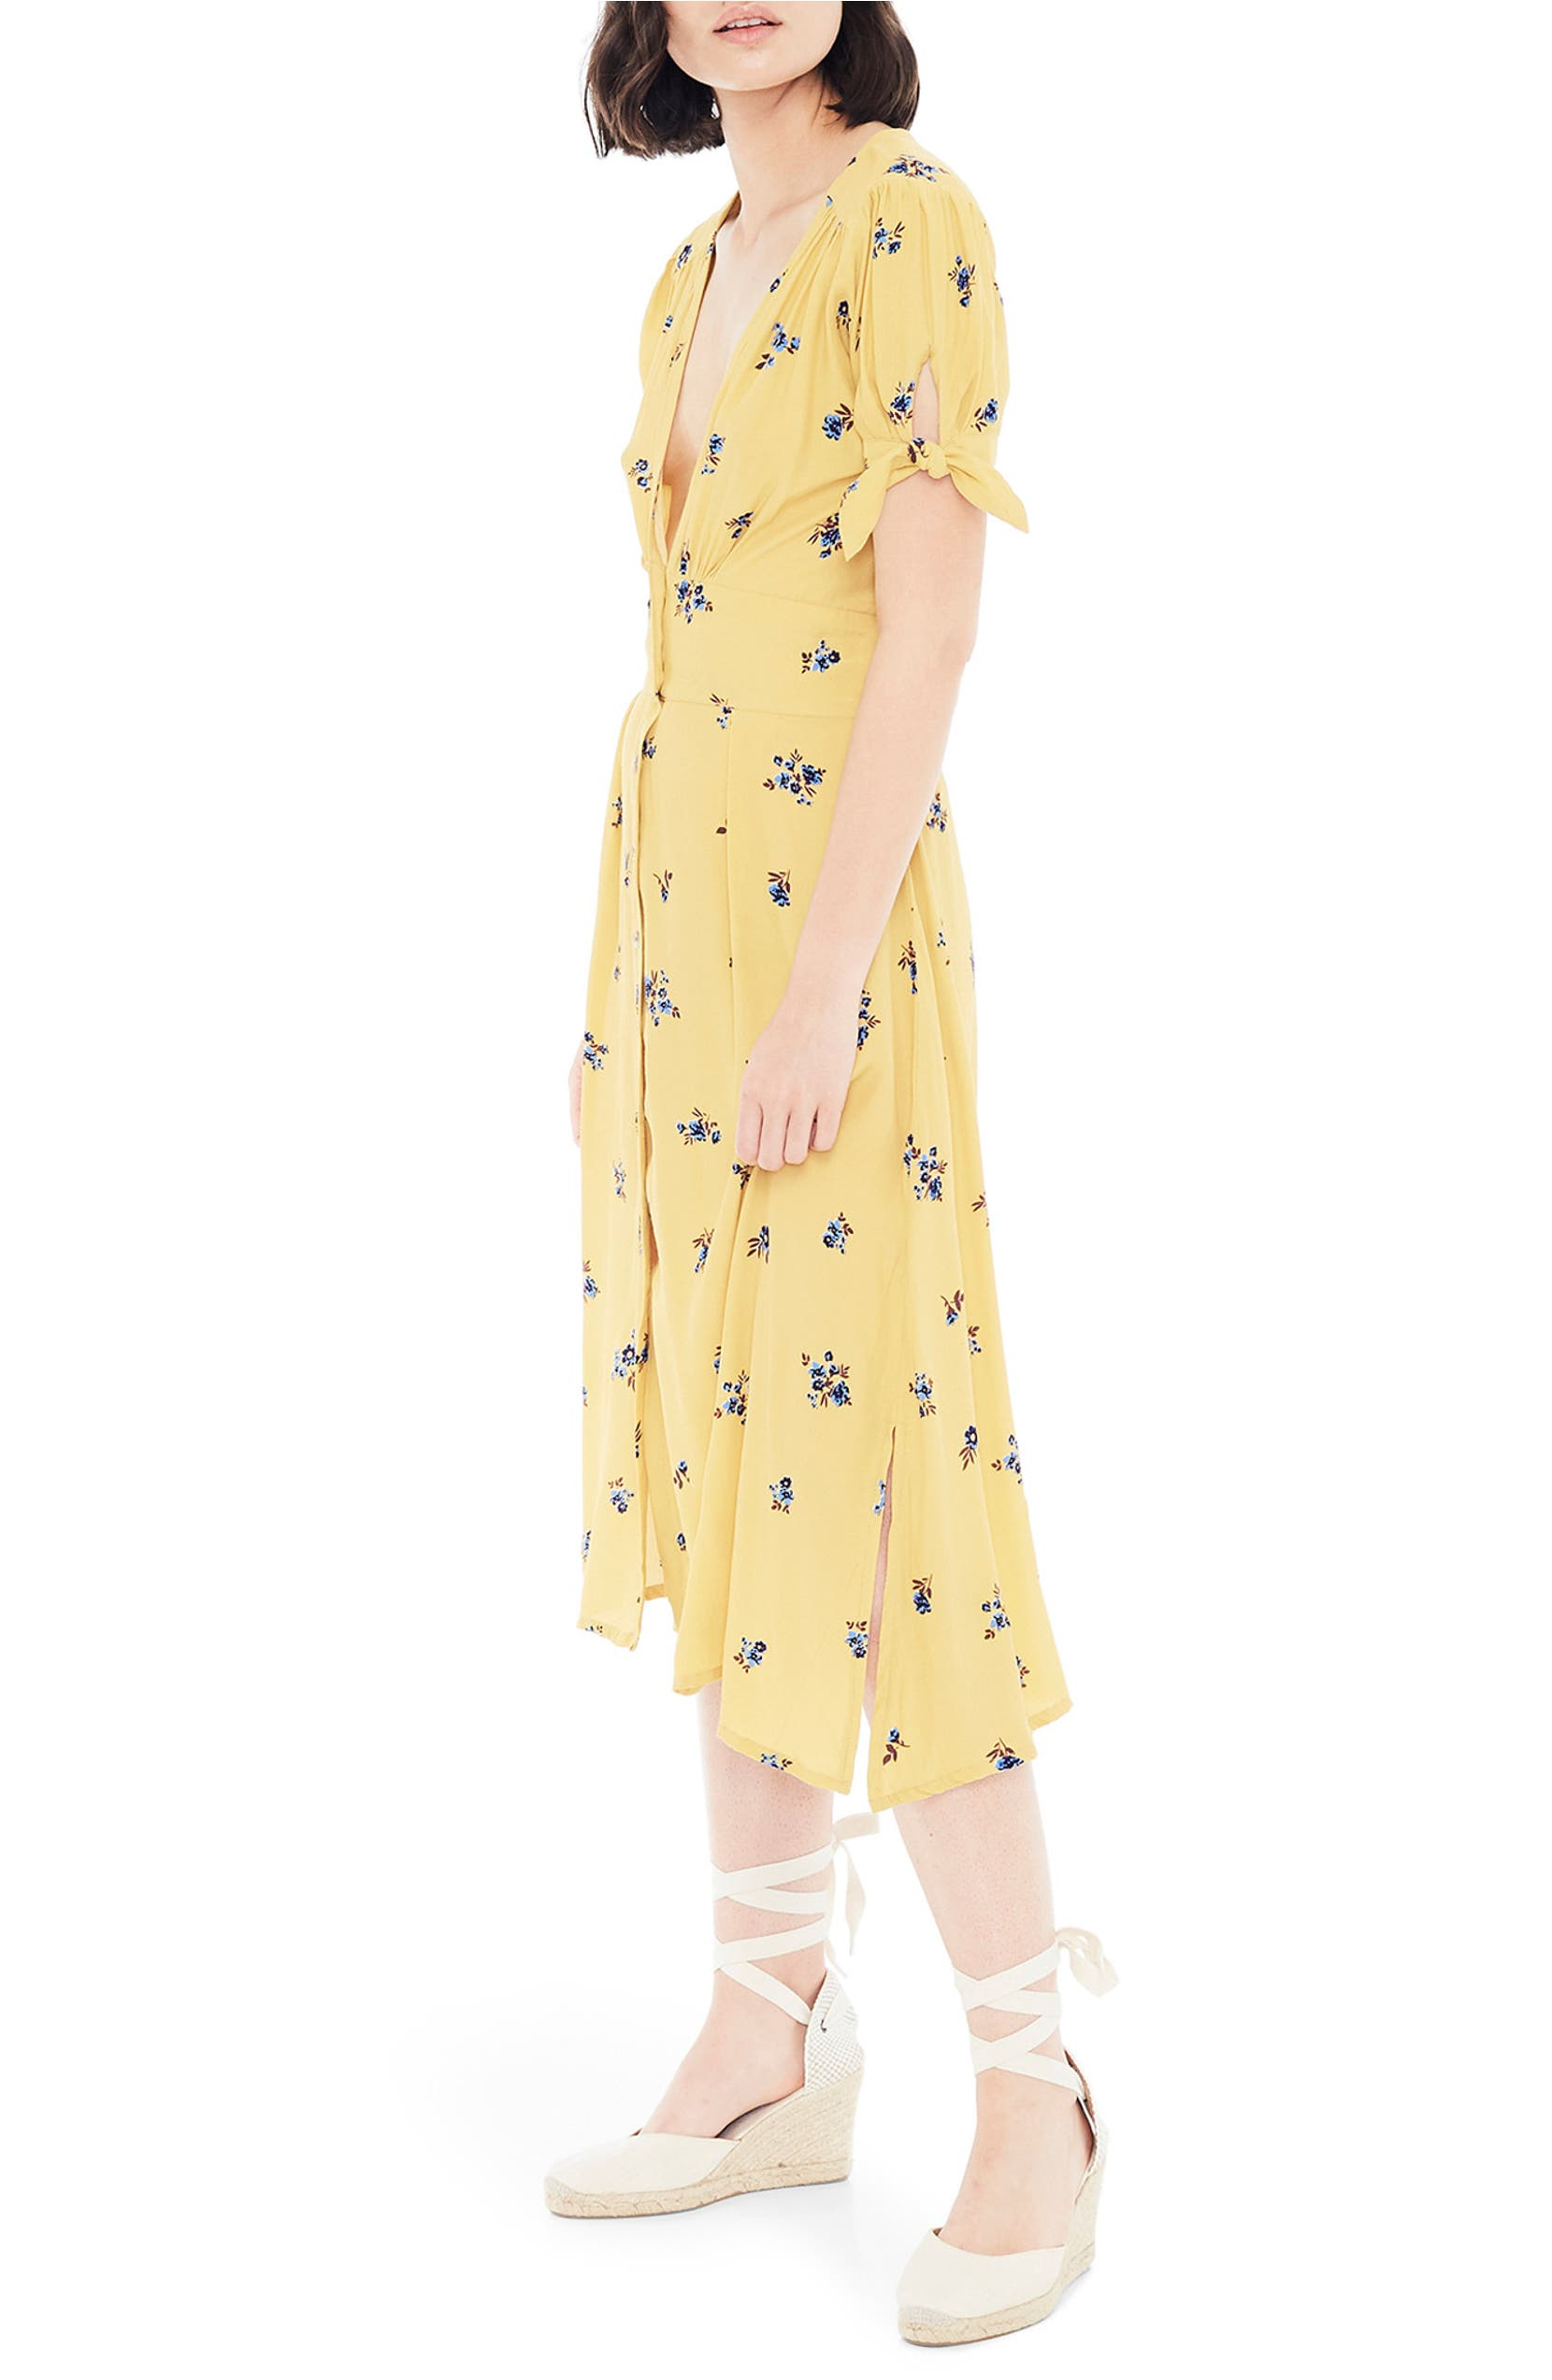 285927dcecdb FAITHFULL THE BRAND Billie Floral Tie Sleeve Midi Dress | Nordstrom